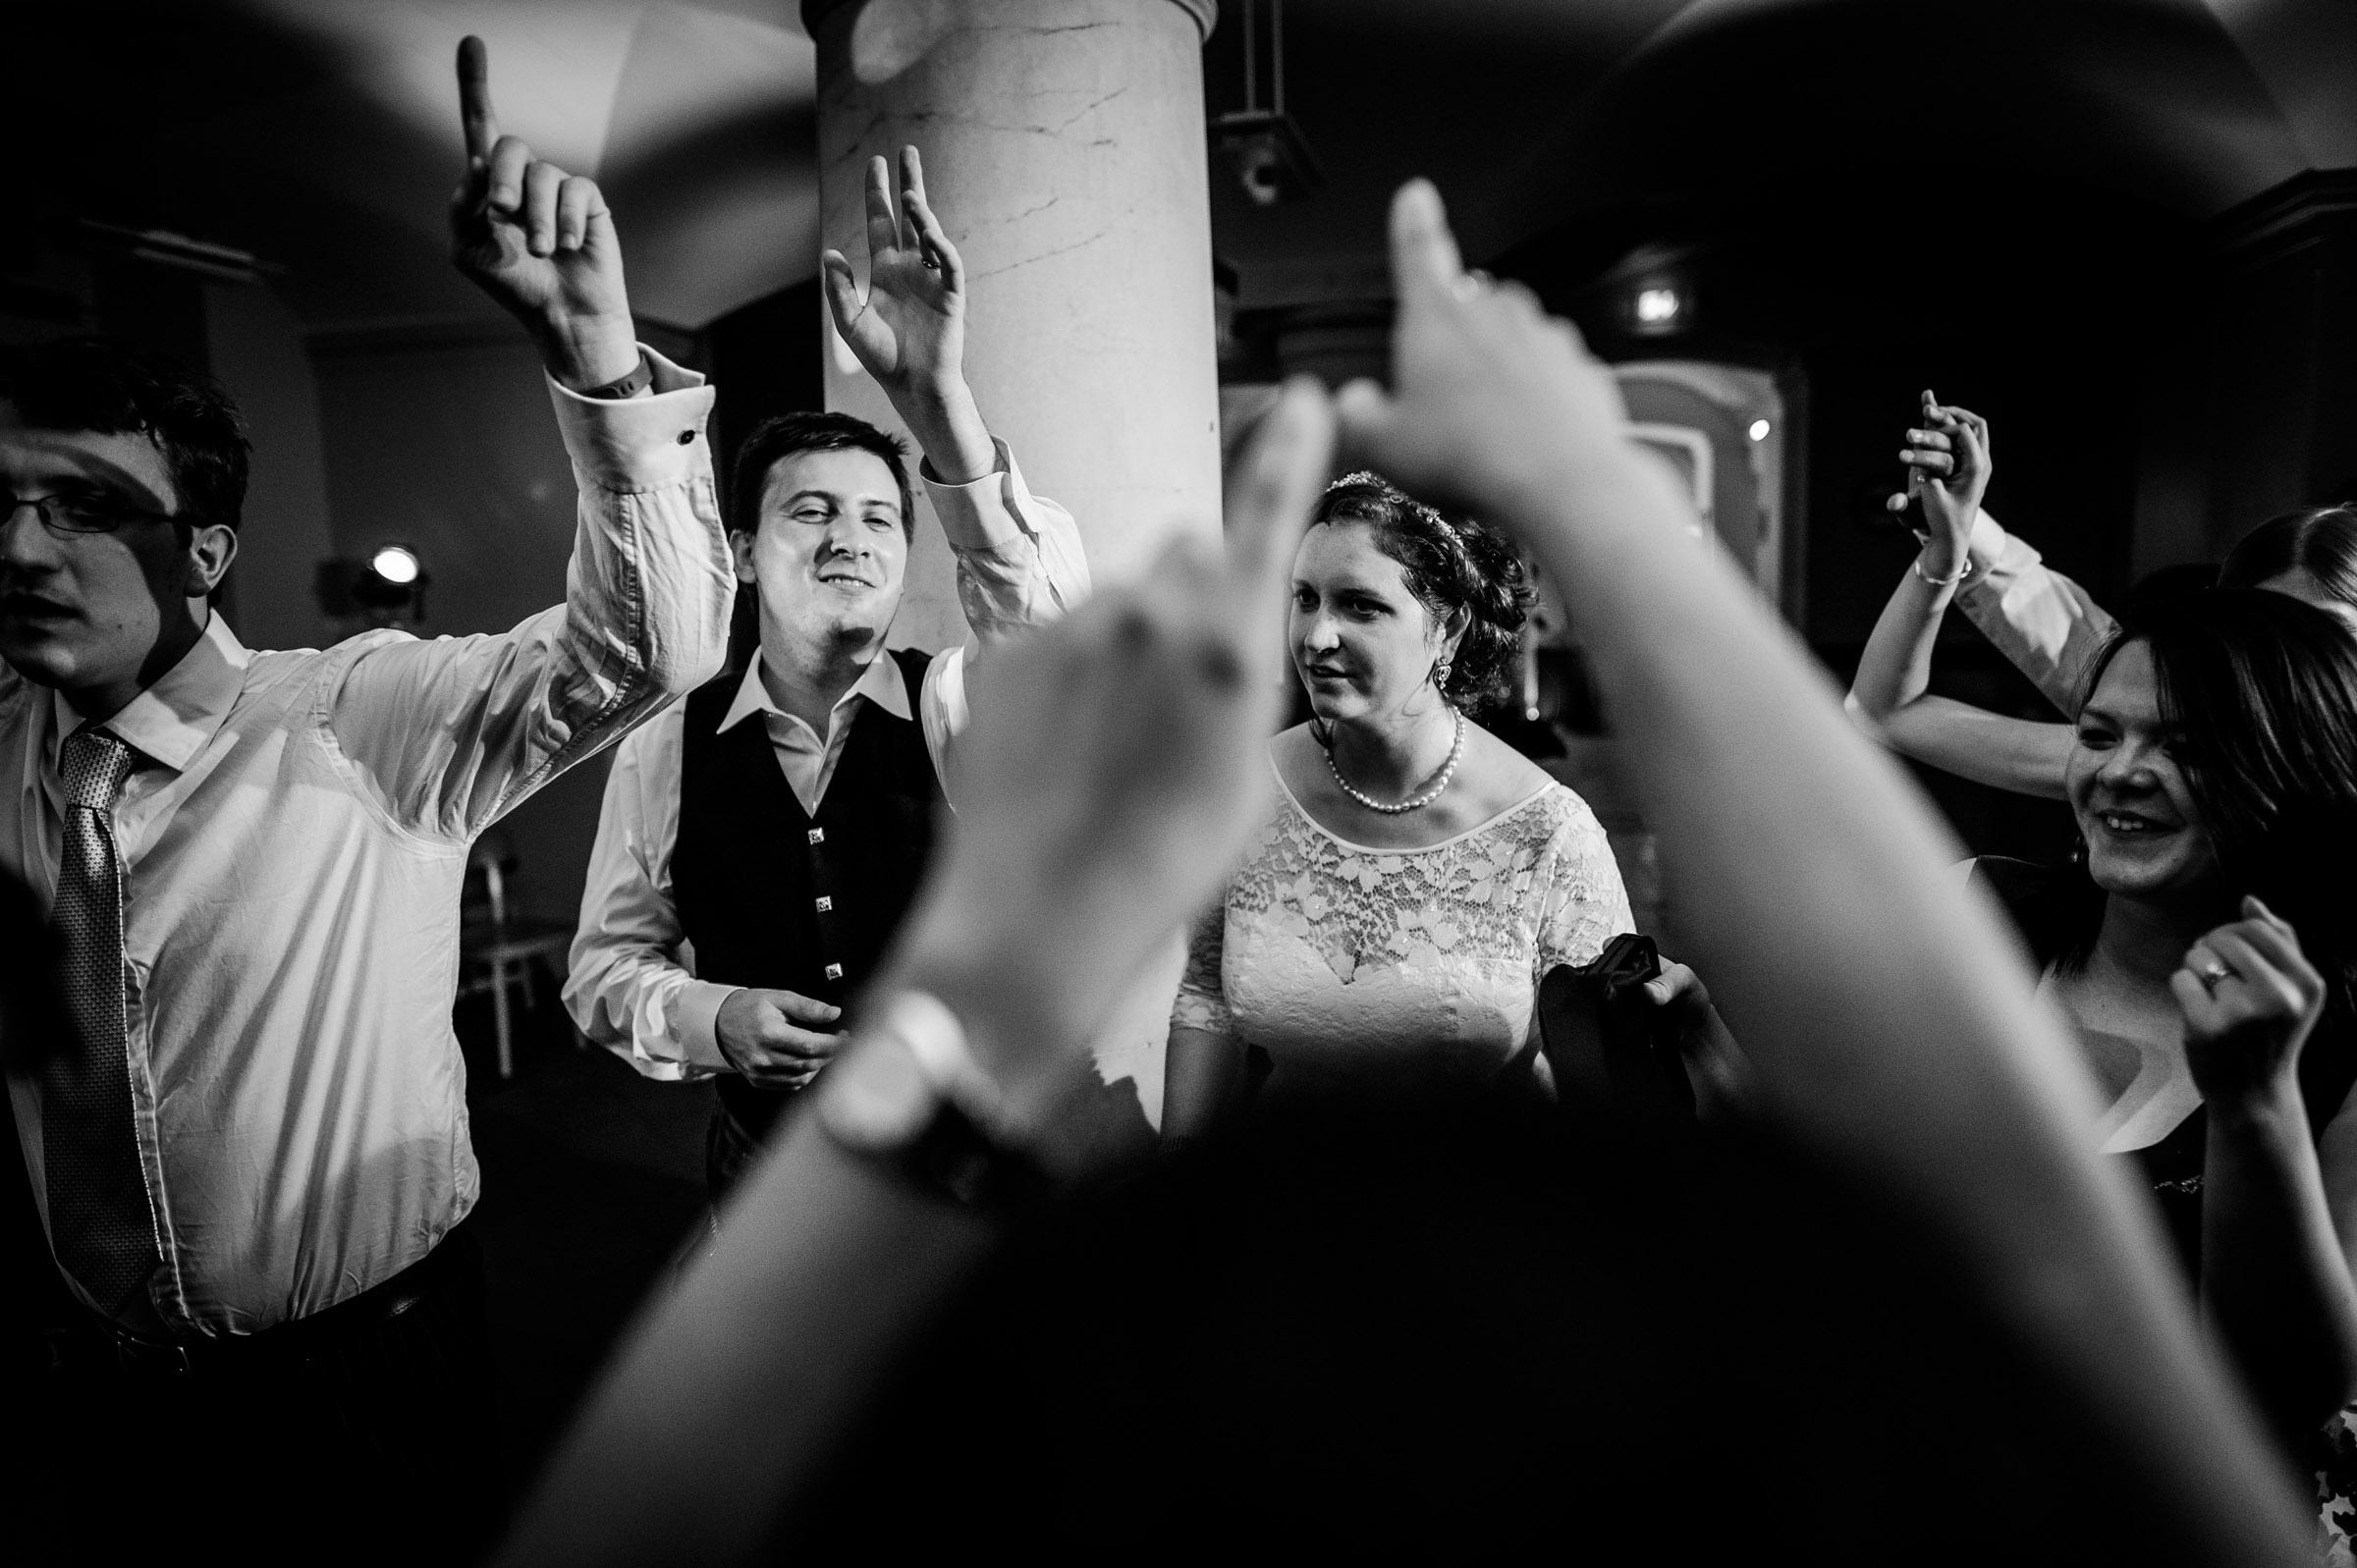 Ashmolean-Museum-Wedding-Pictures-0078.jpg